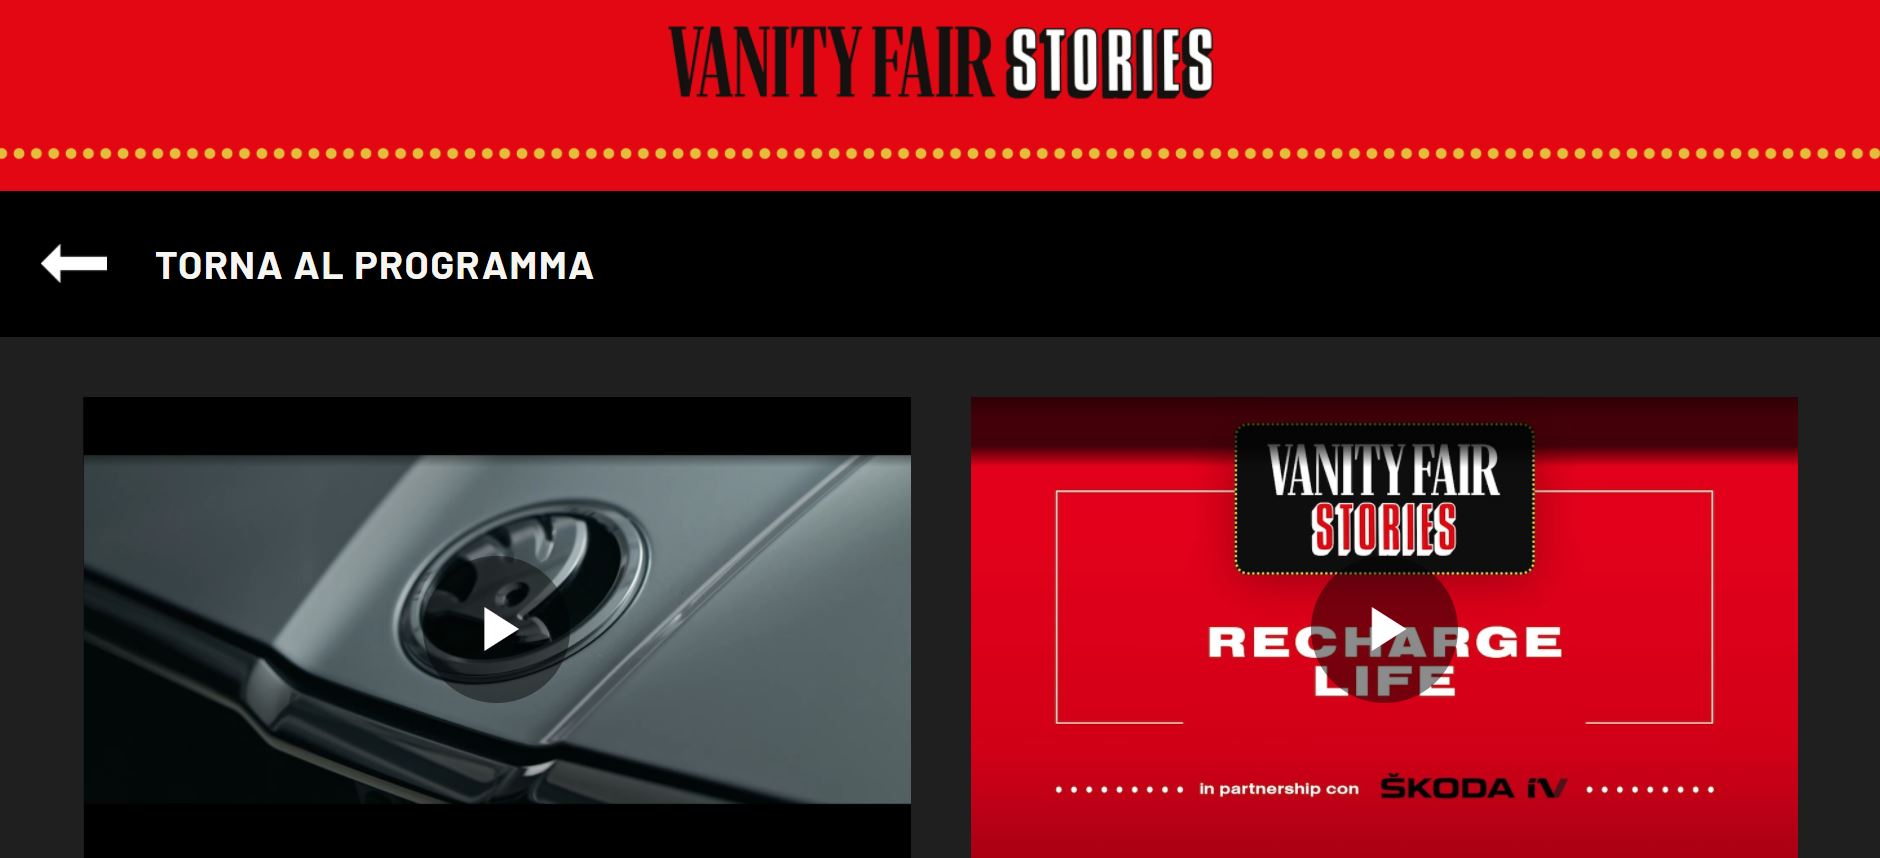 Skoda VFS 2 - Benedetta Malavasi - Italy - Vanity Fair Stories - Sponsor 2